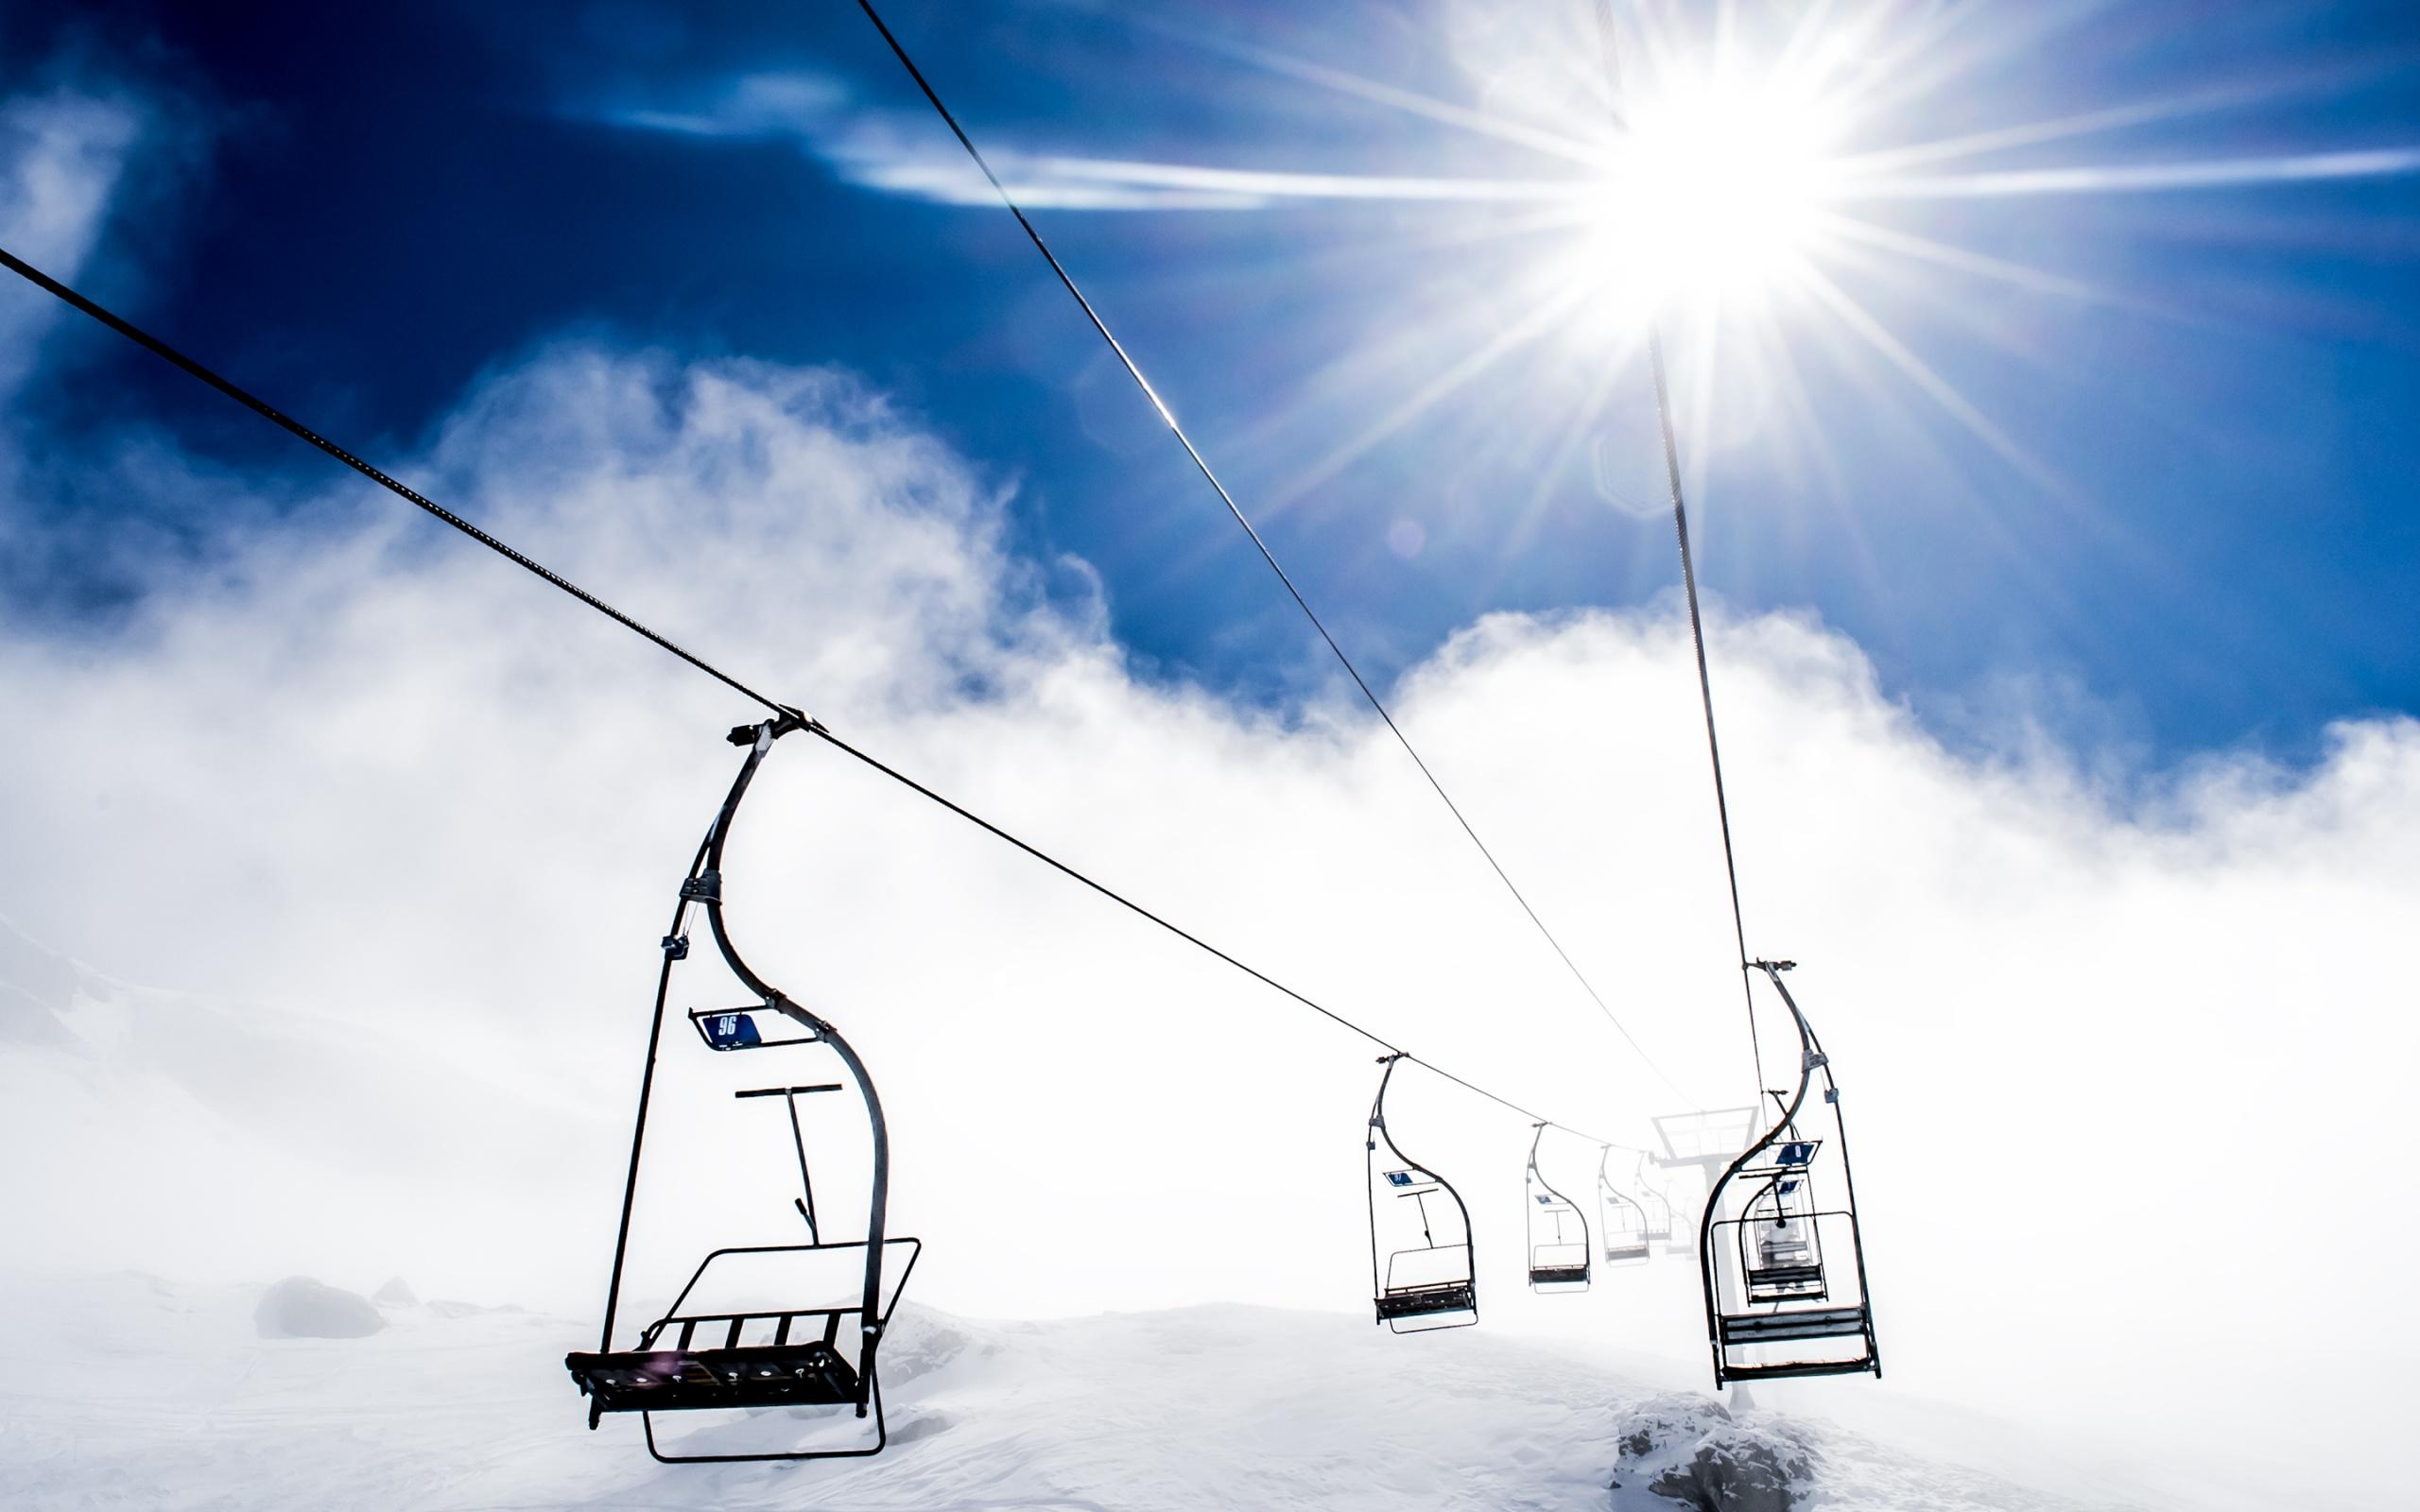 Skilift  Wikipedia